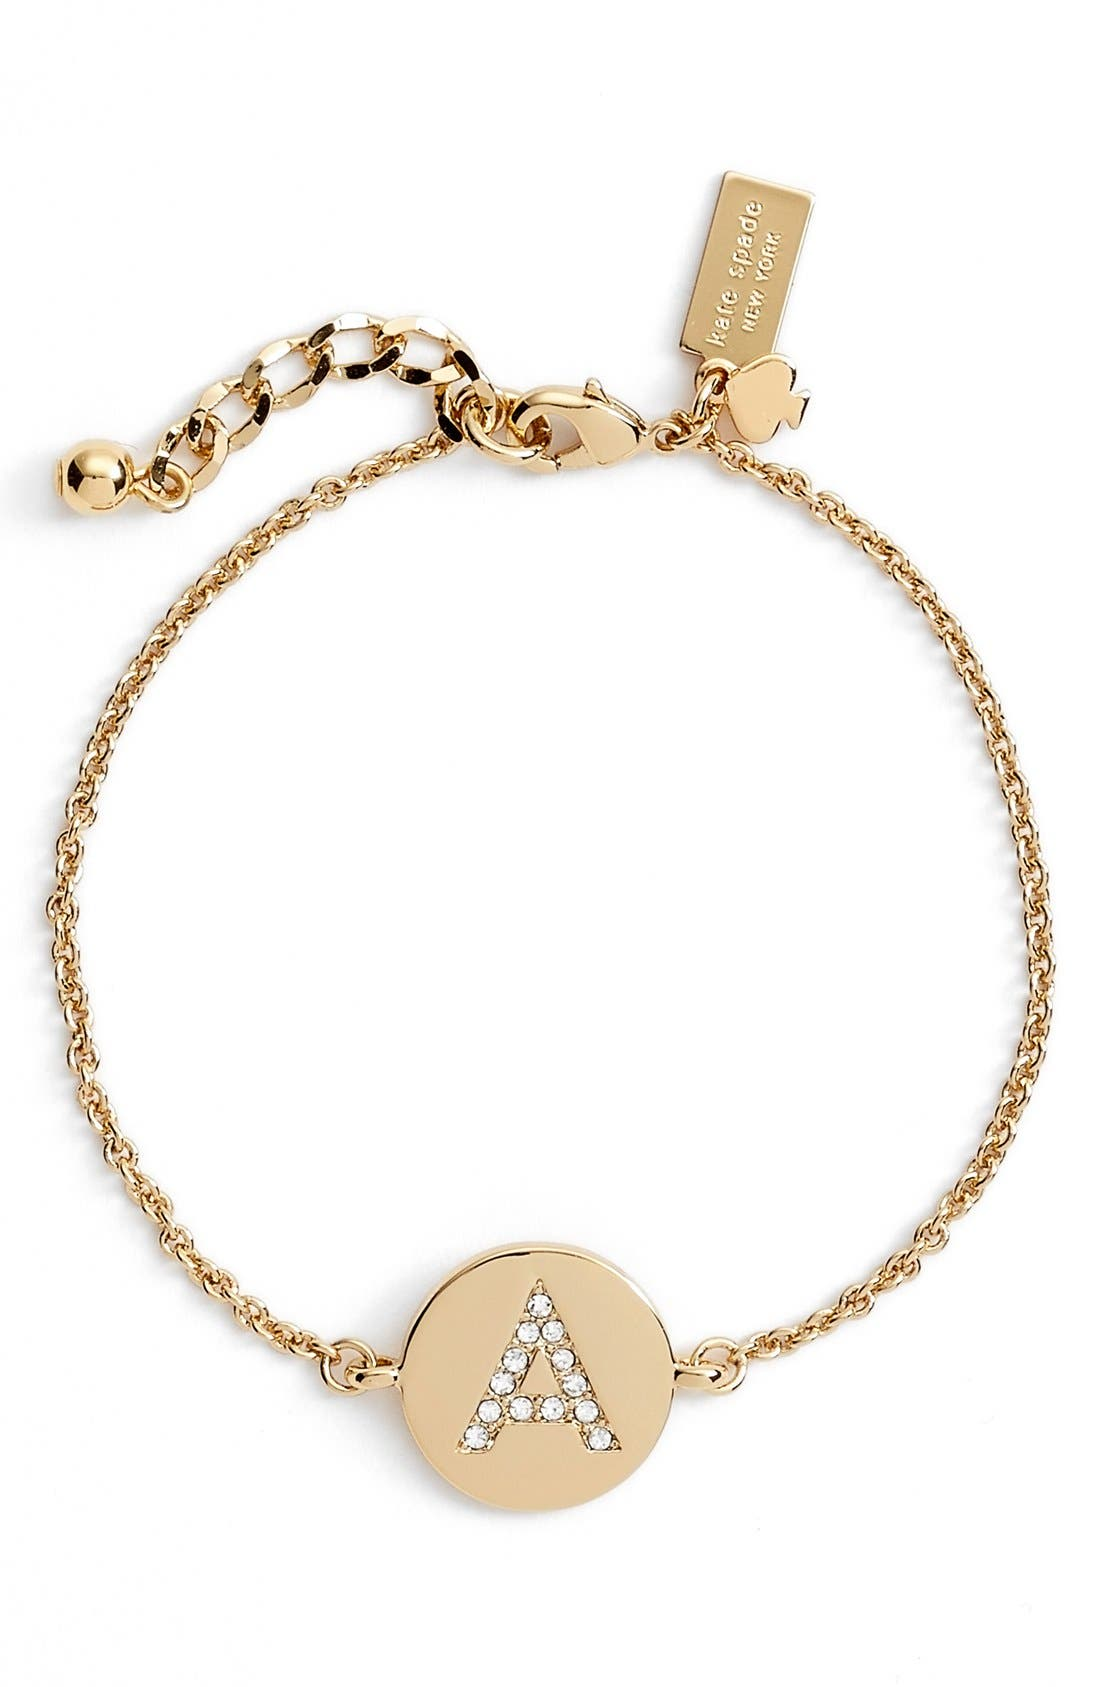 KATE SPADE NEW YORK, 'north court' pavé initial charm bracelet, Main thumbnail 1, color, 710